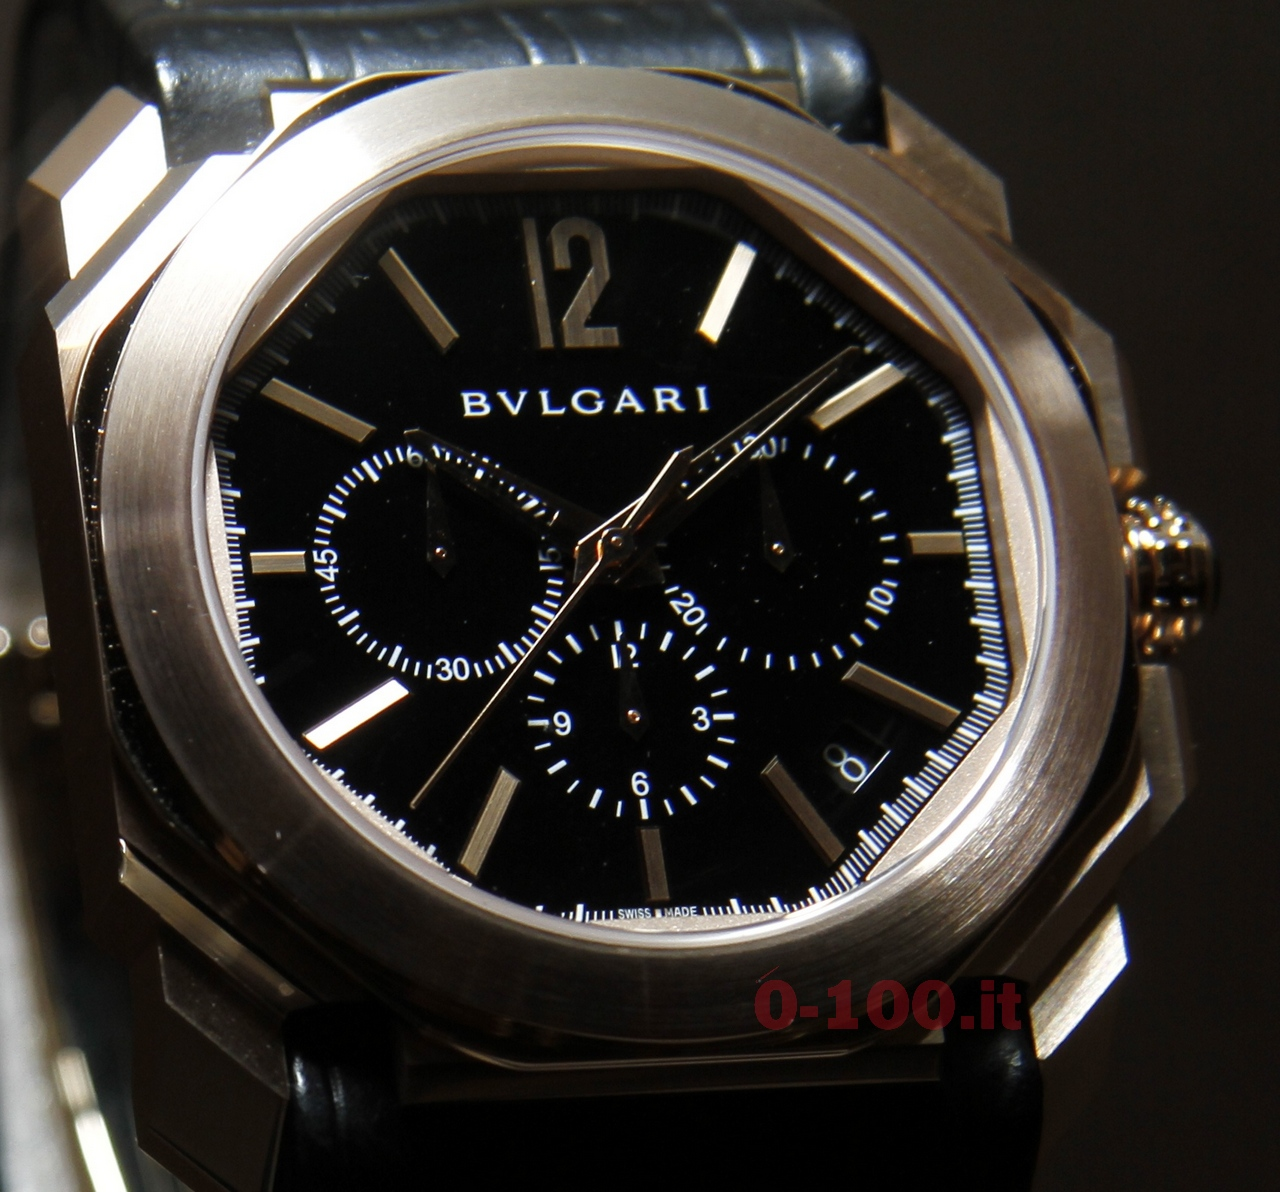 baselworld-2014-bulgari-octo-velocissimo_0-1007